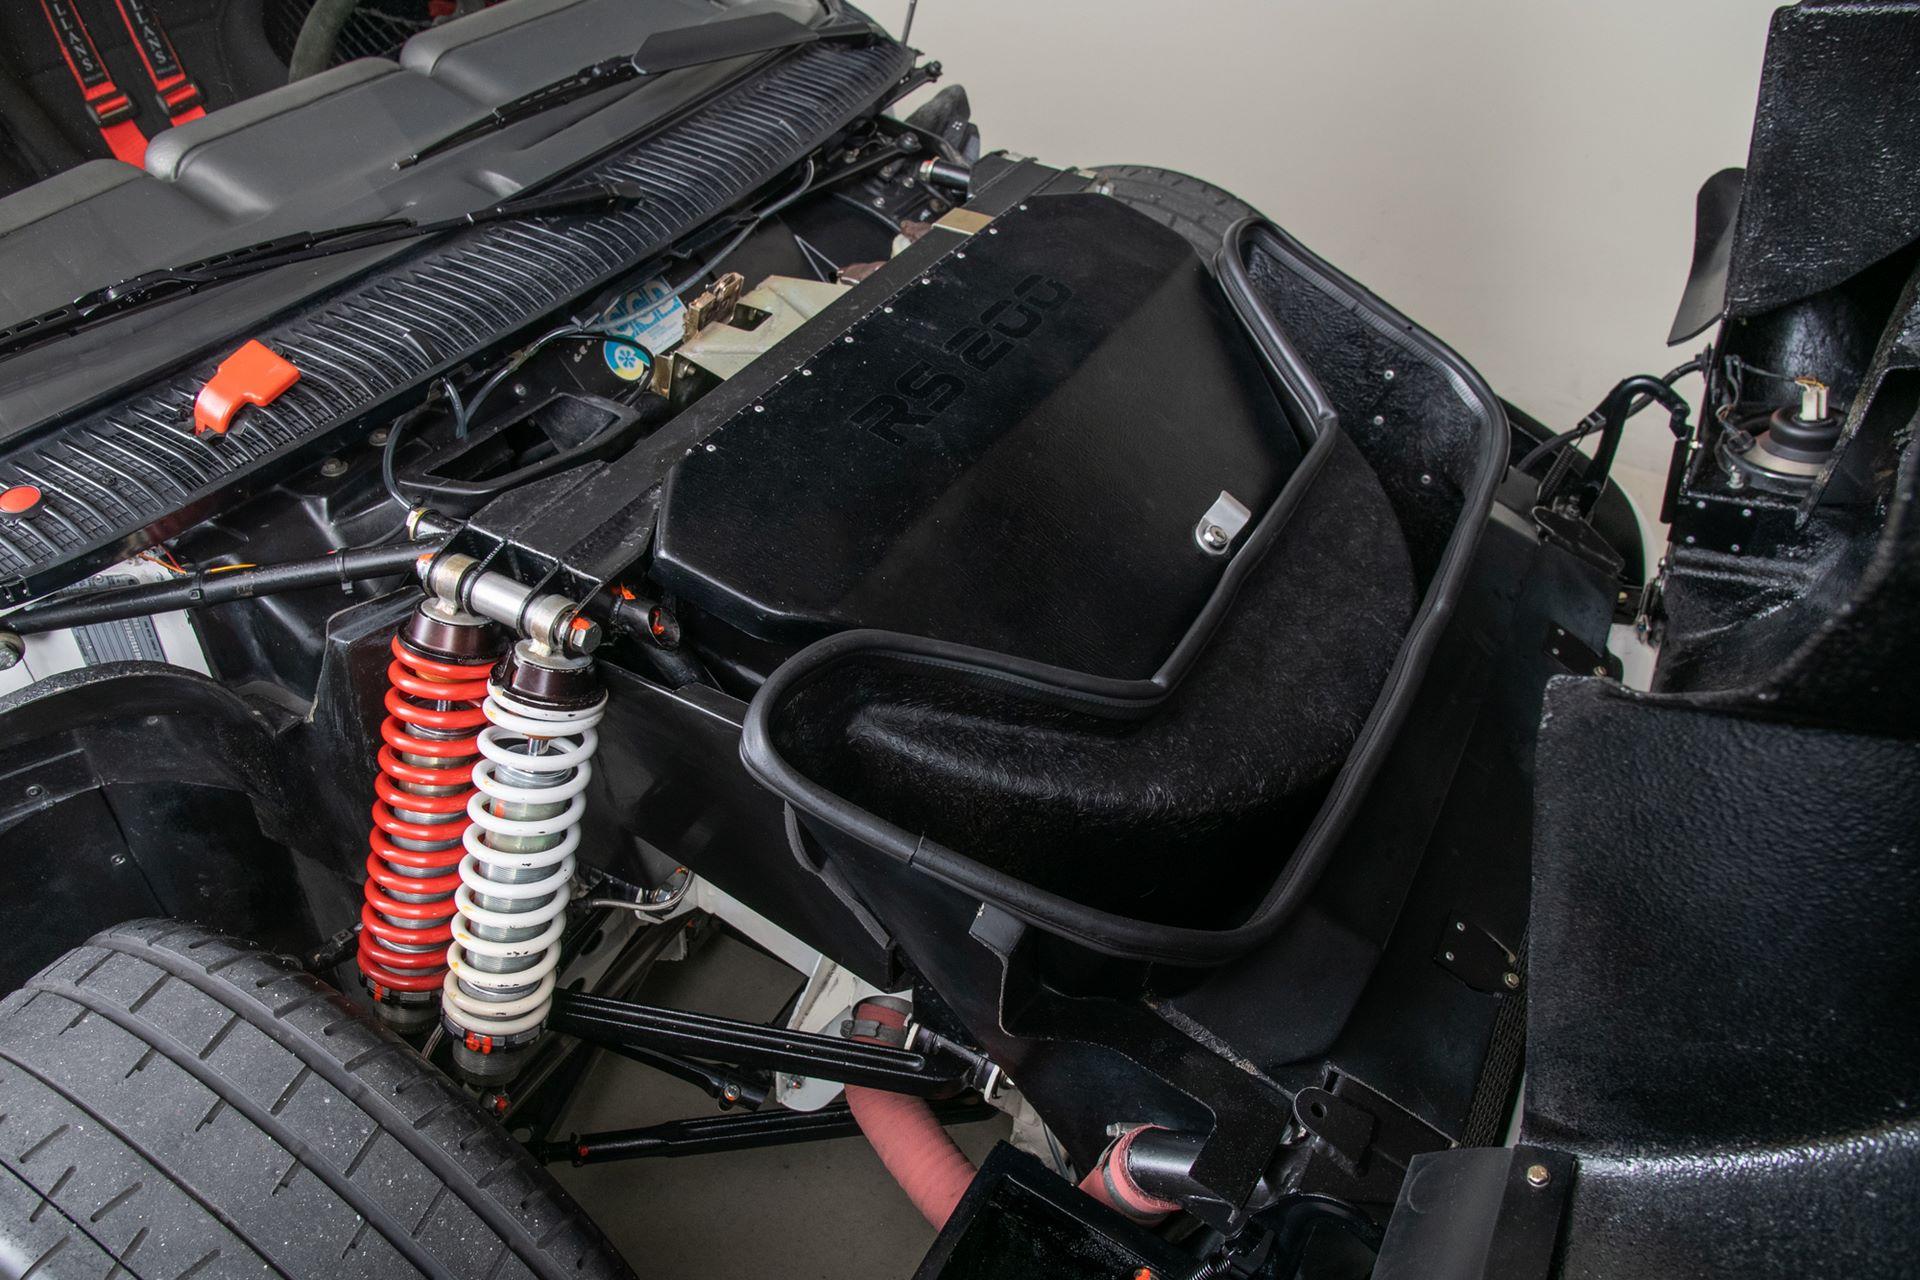 Ford-RS200-Evolution-Evo-for-sale-38